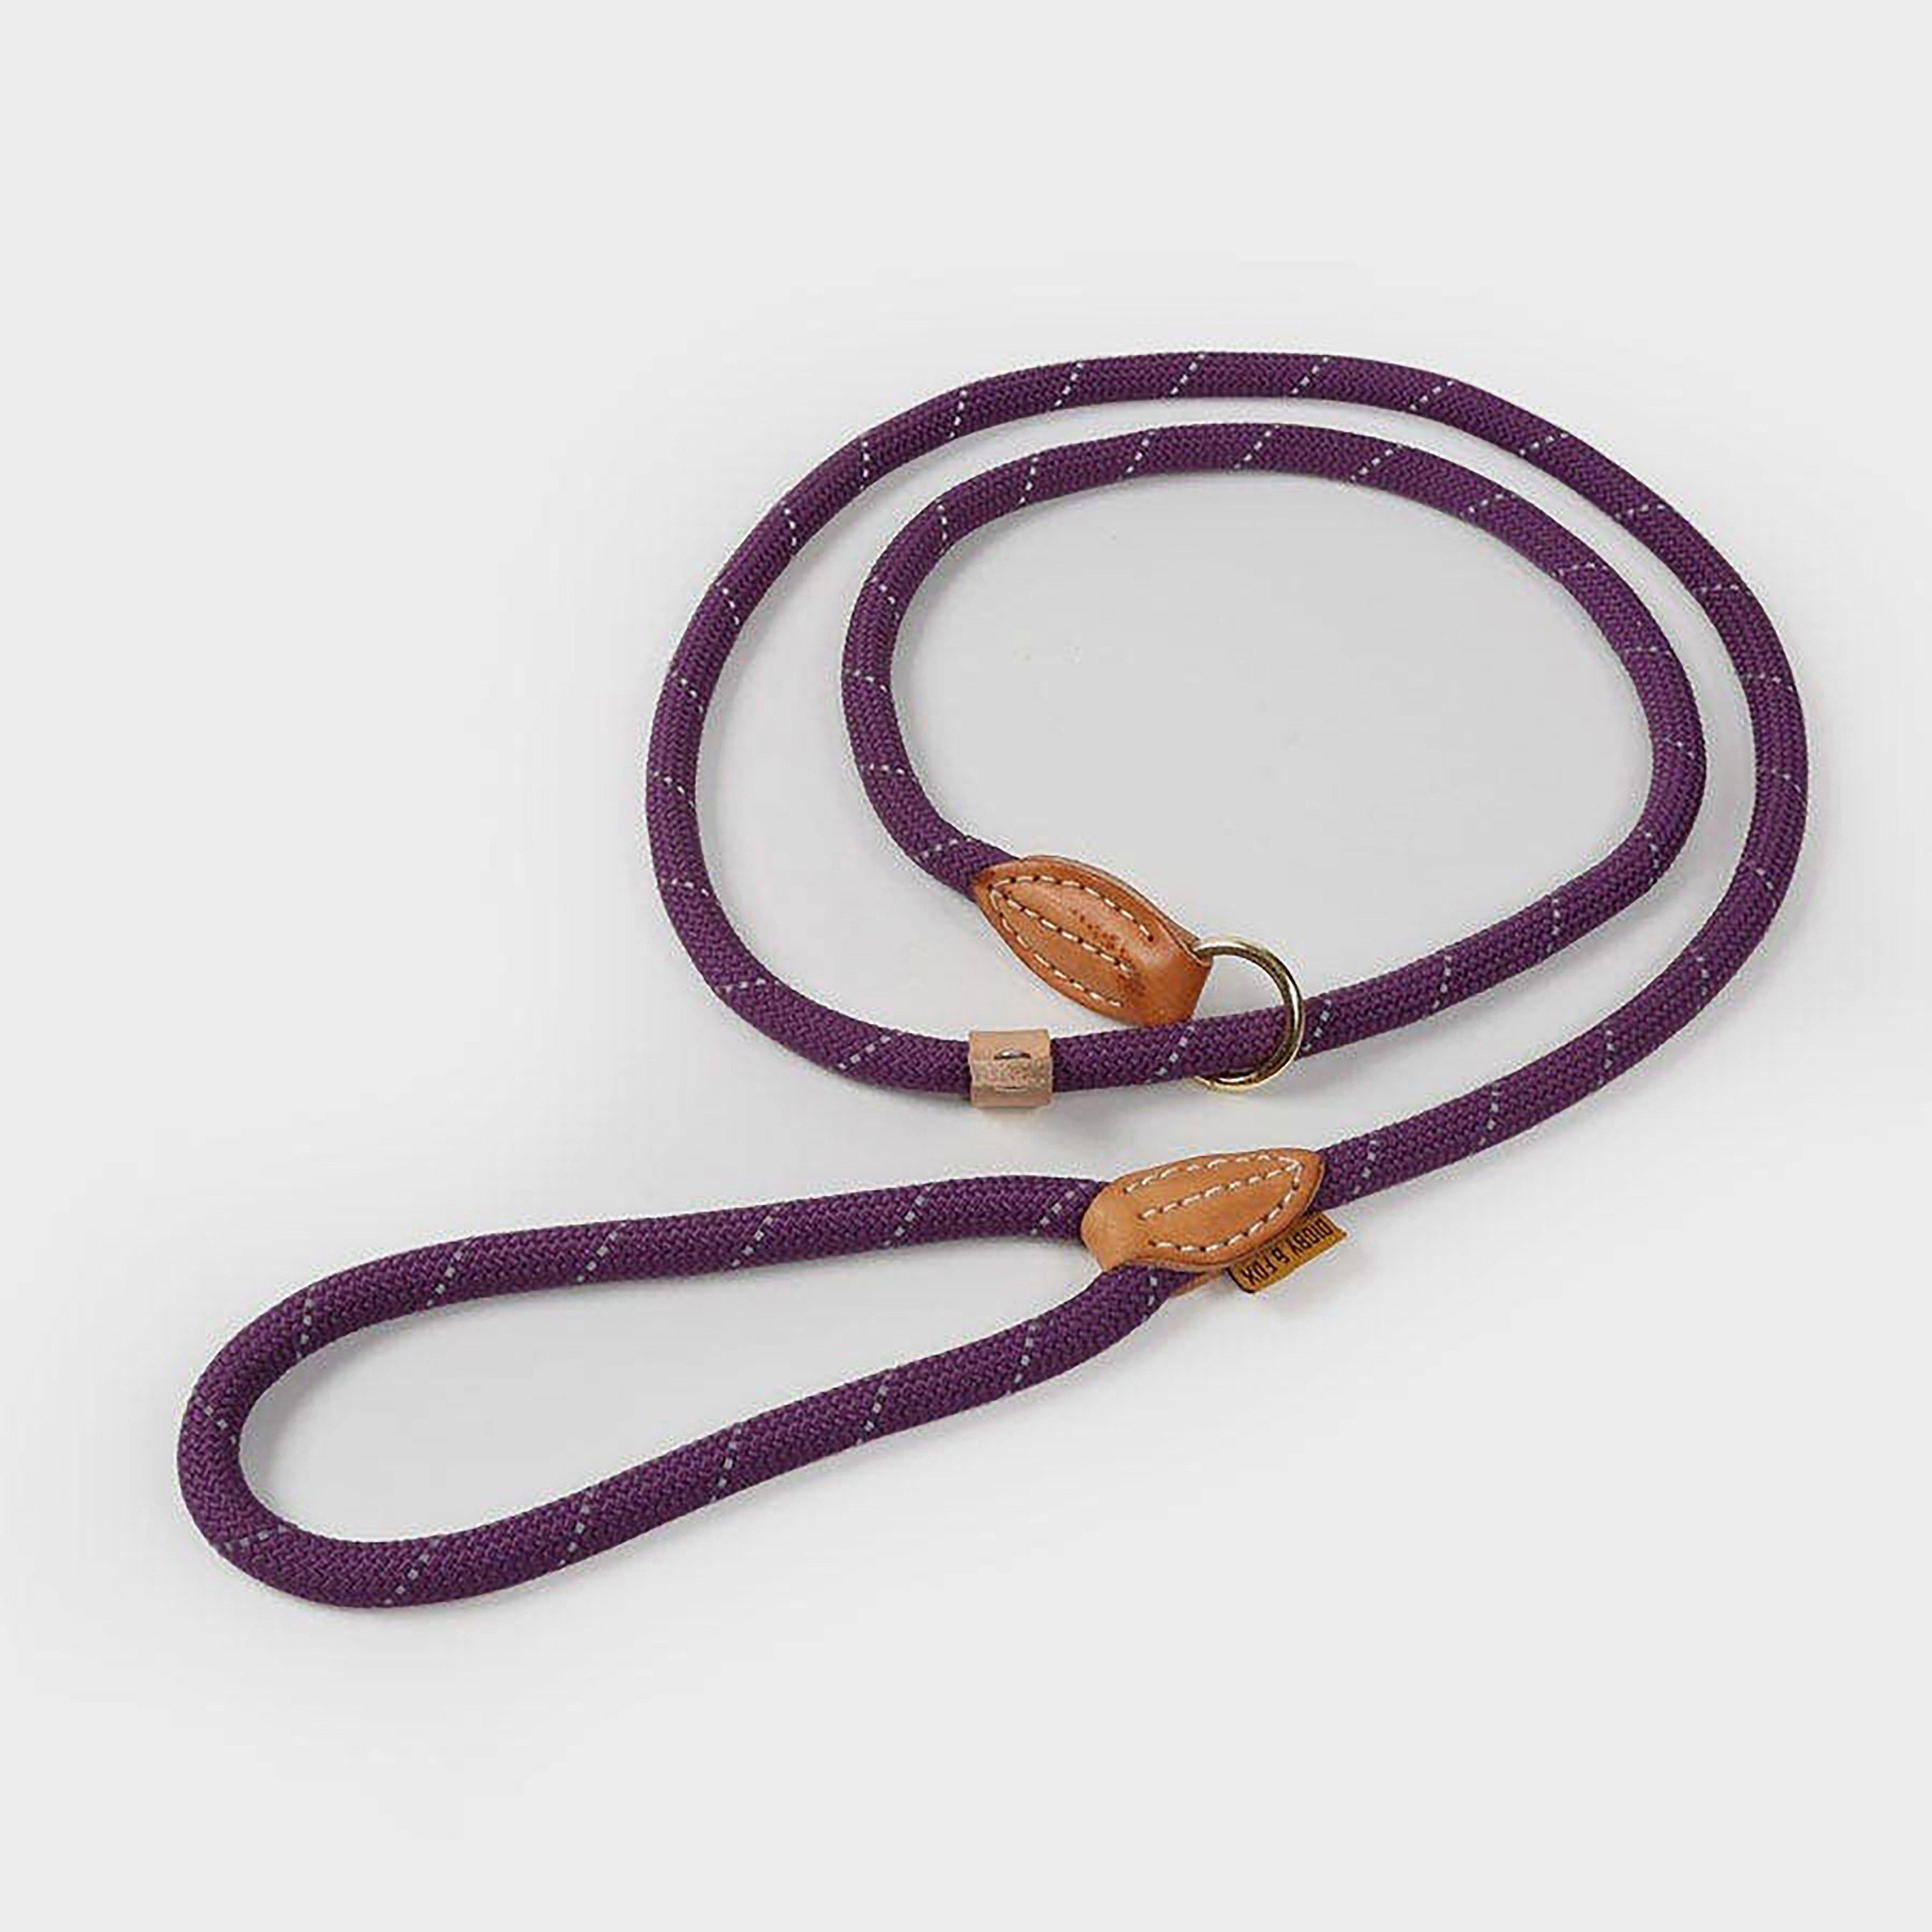 Image of Shires Digby & Fox Reflective Slip Dog Lead - Purple/Purple, PURPLE/Purple